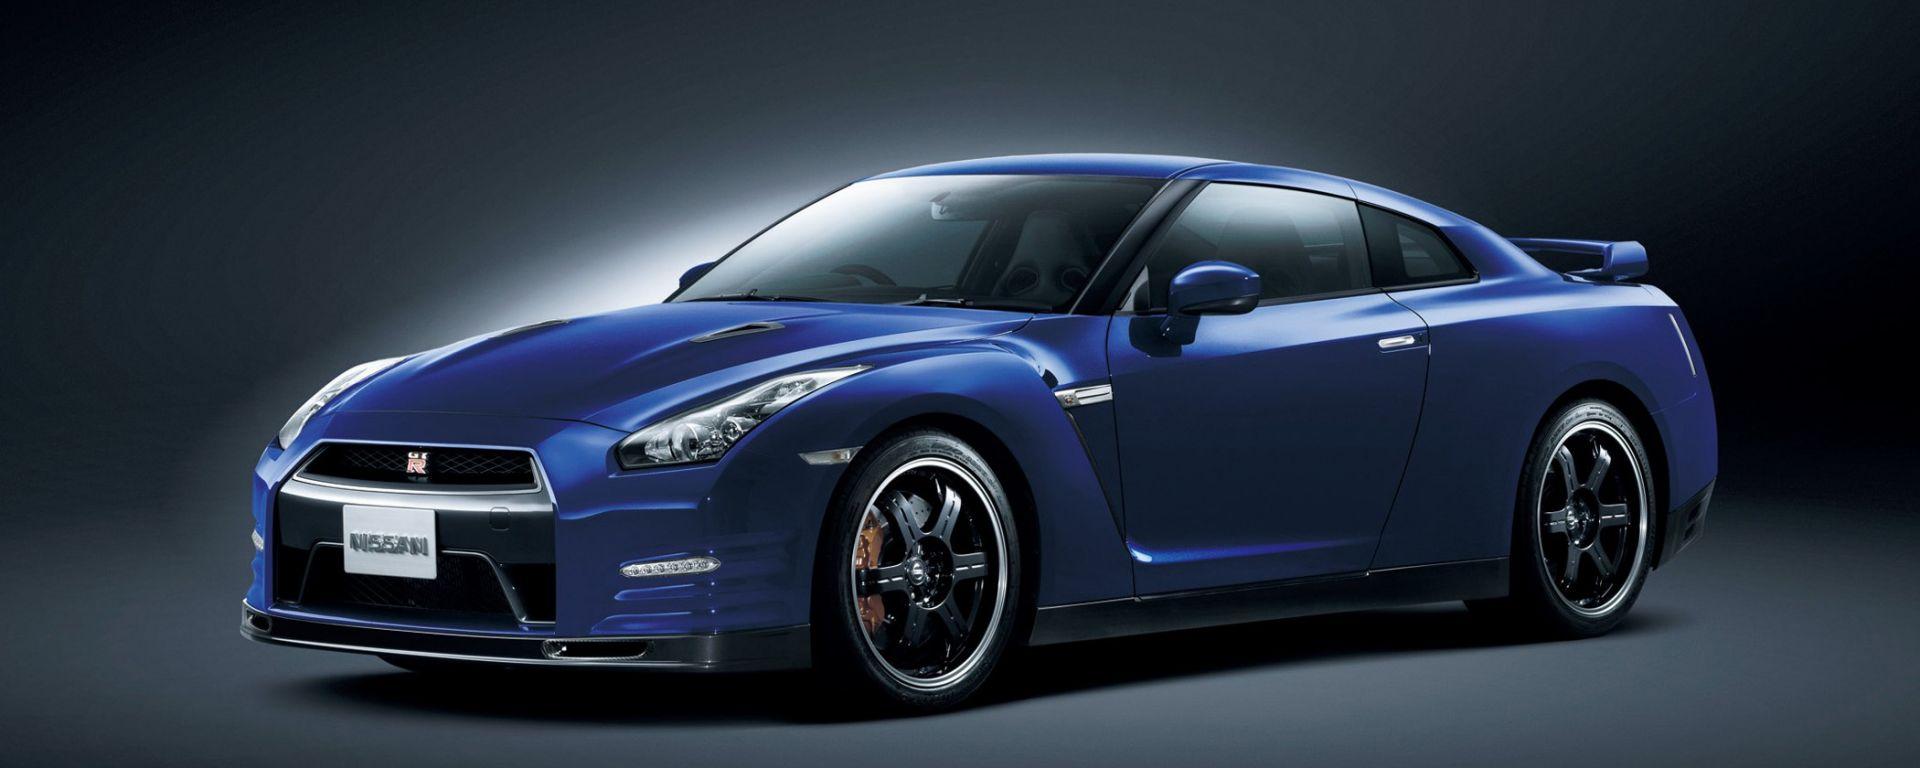 Nissan GT-R my 2012